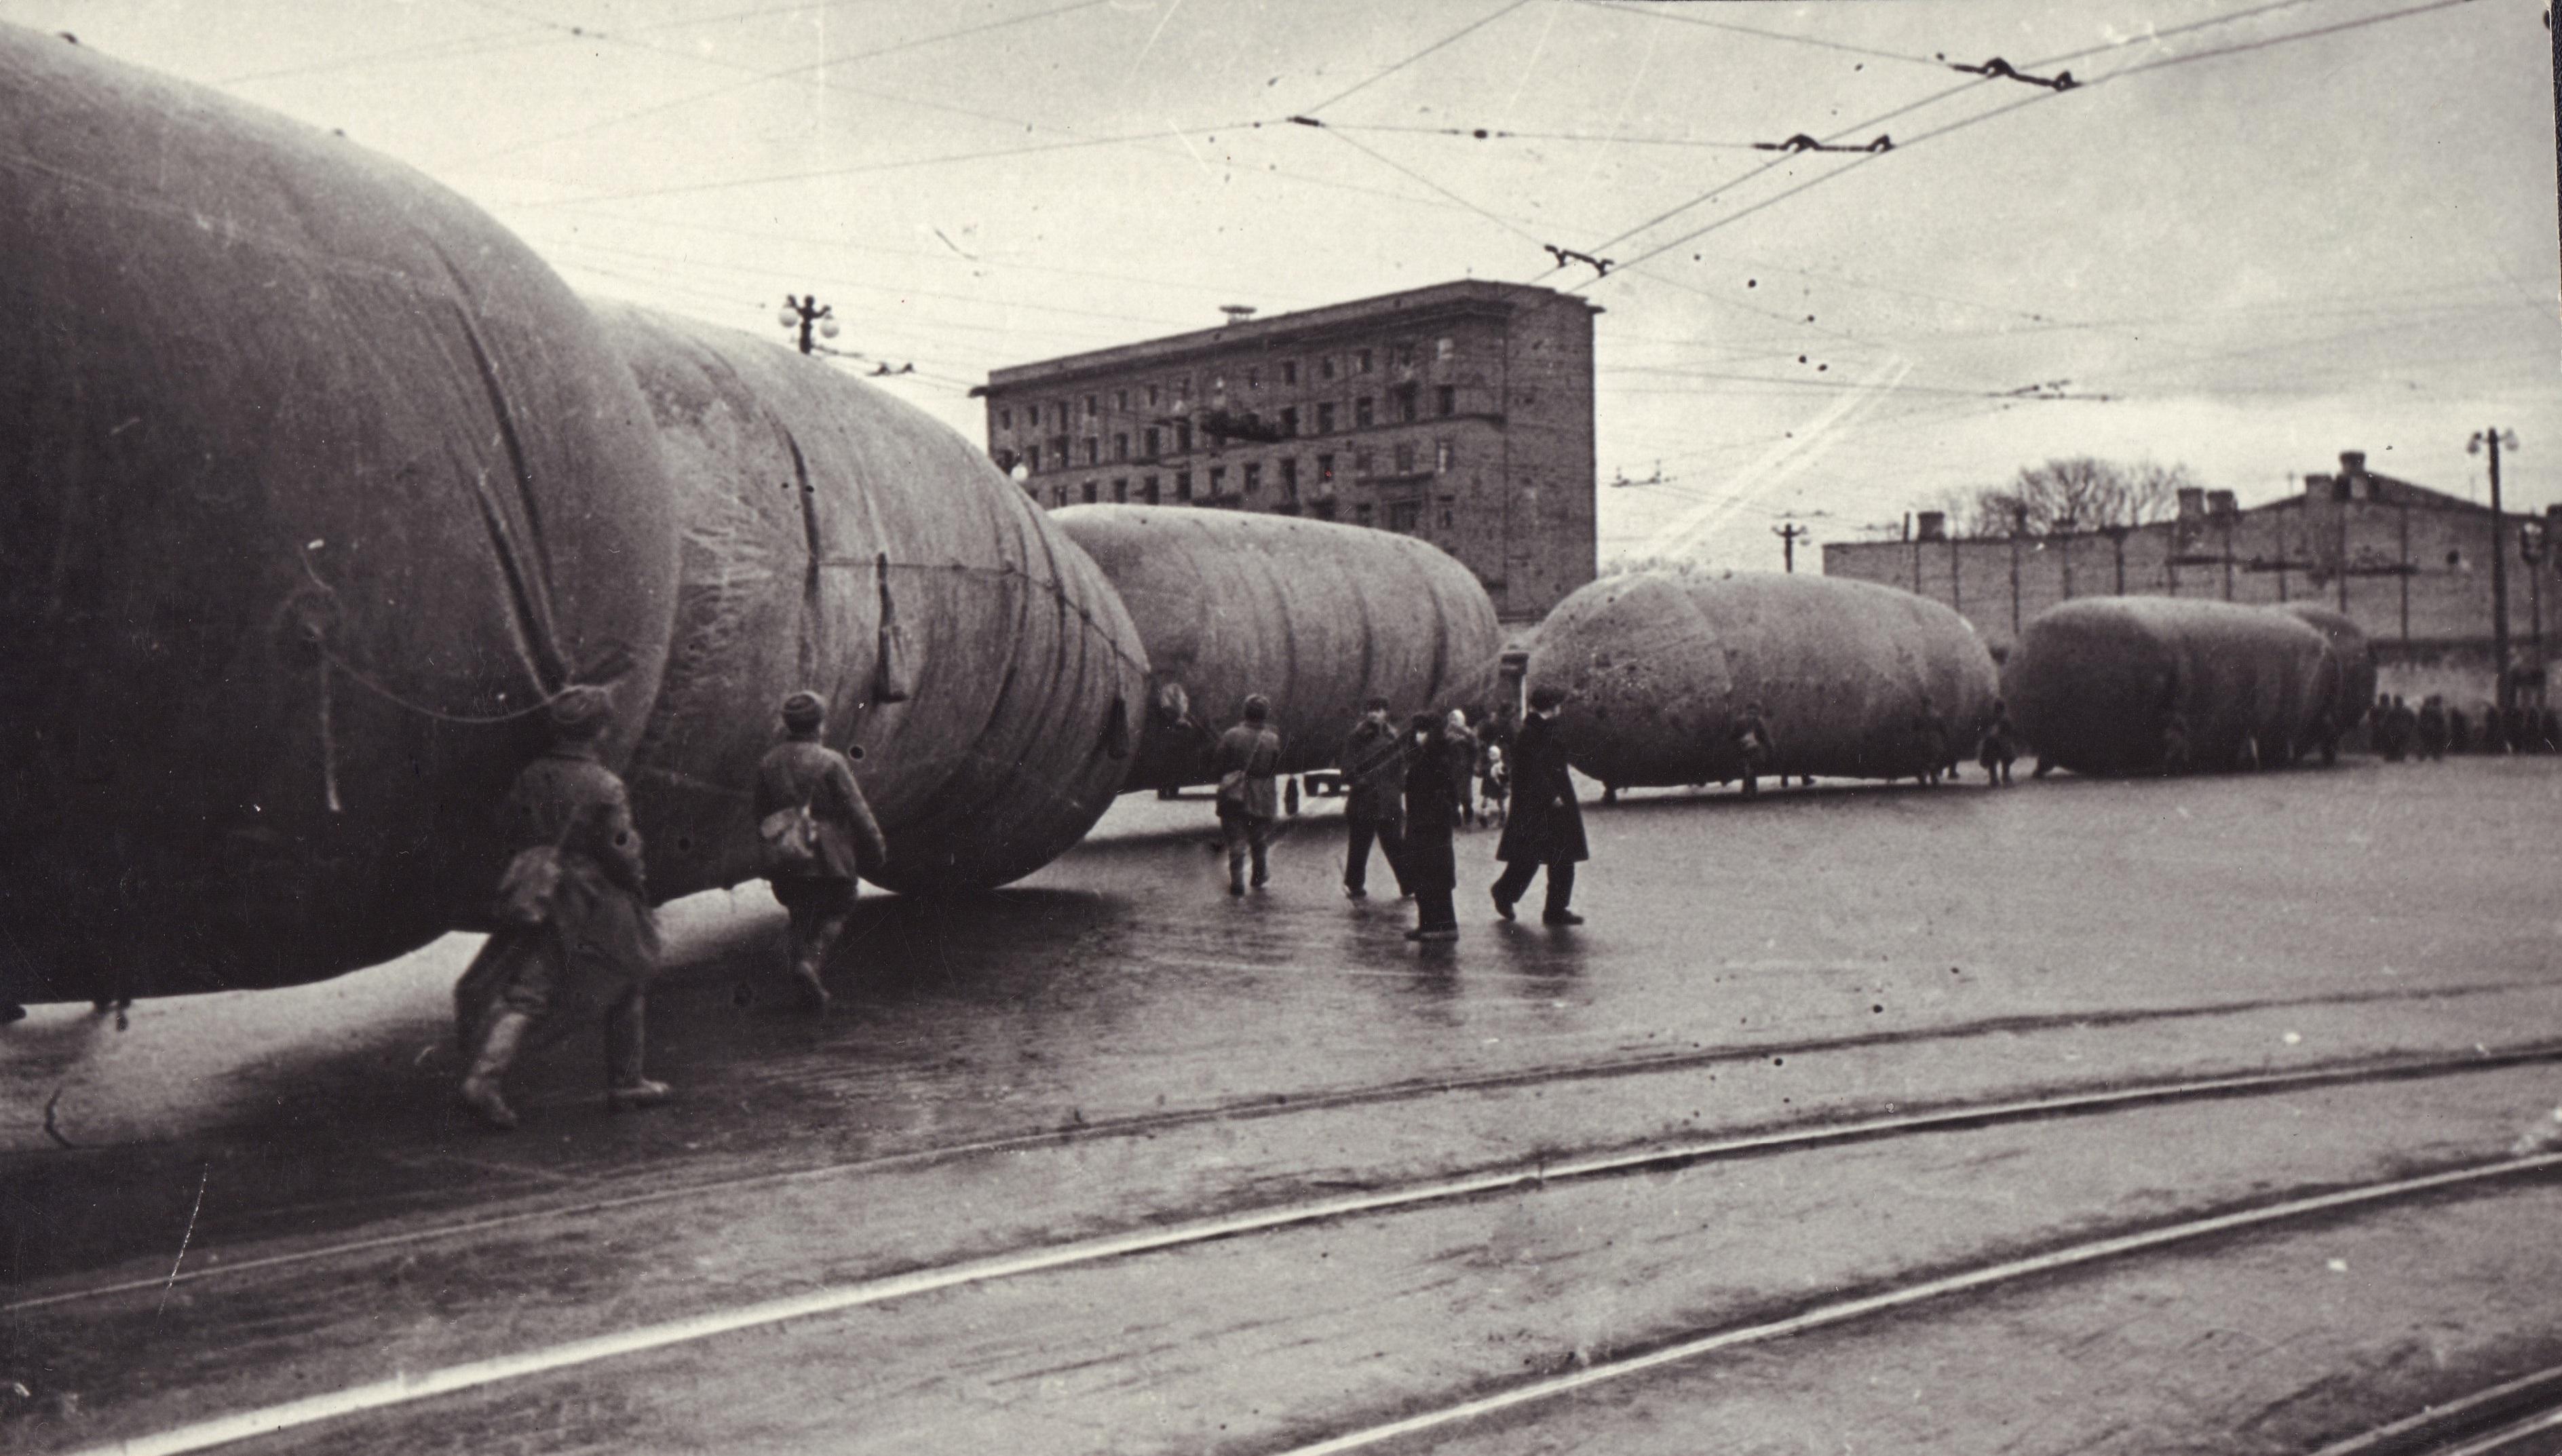 Выставка «Битва за Москву. Первая Победа»